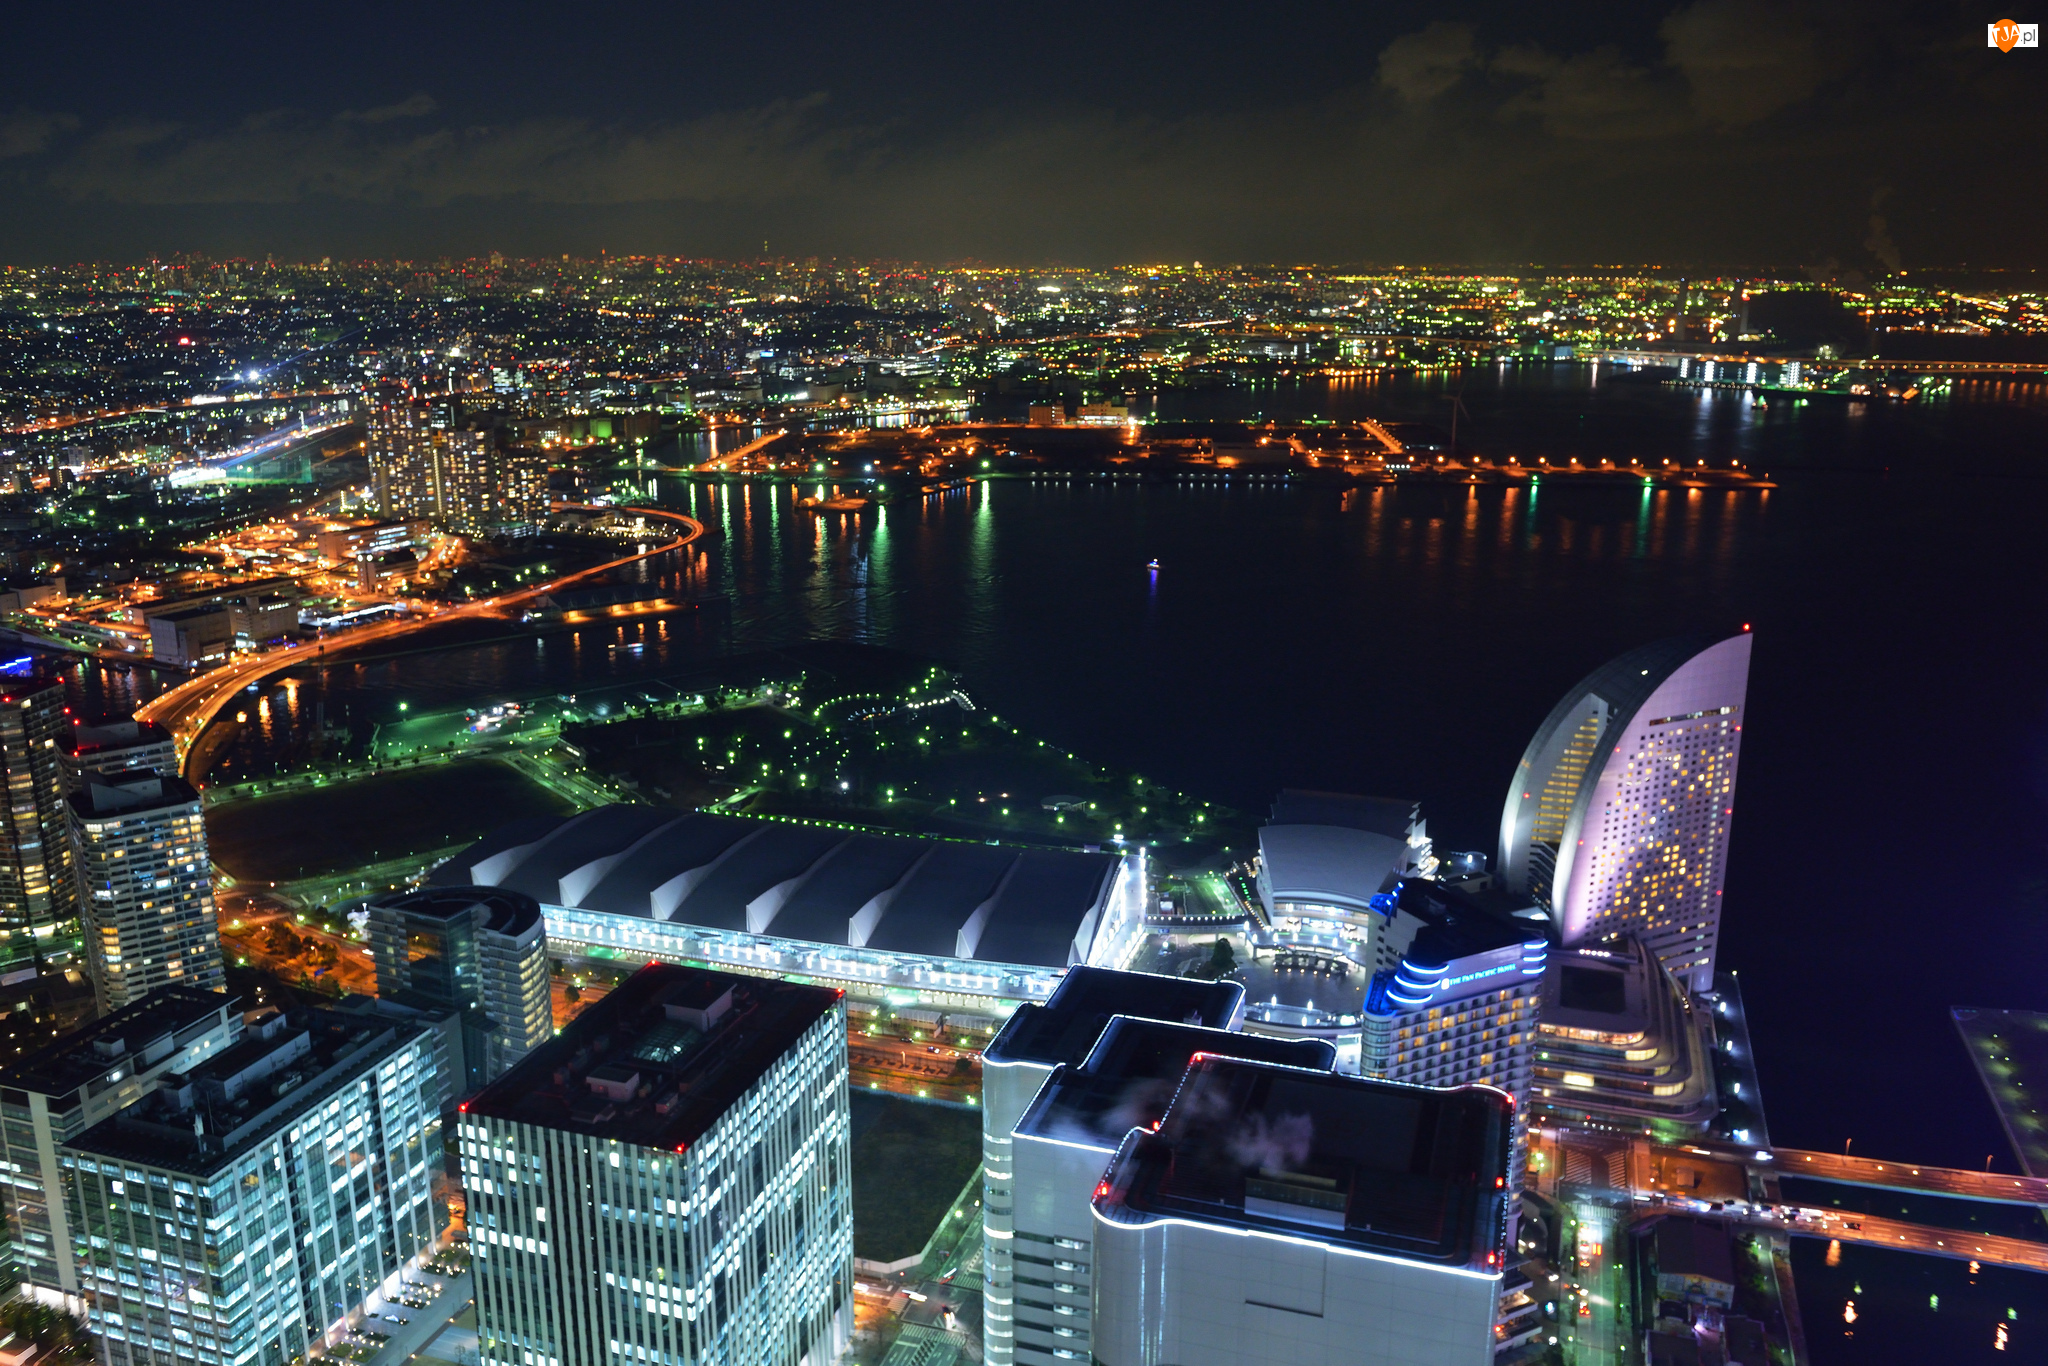 Jokohama, Dom, Japonia, Noc